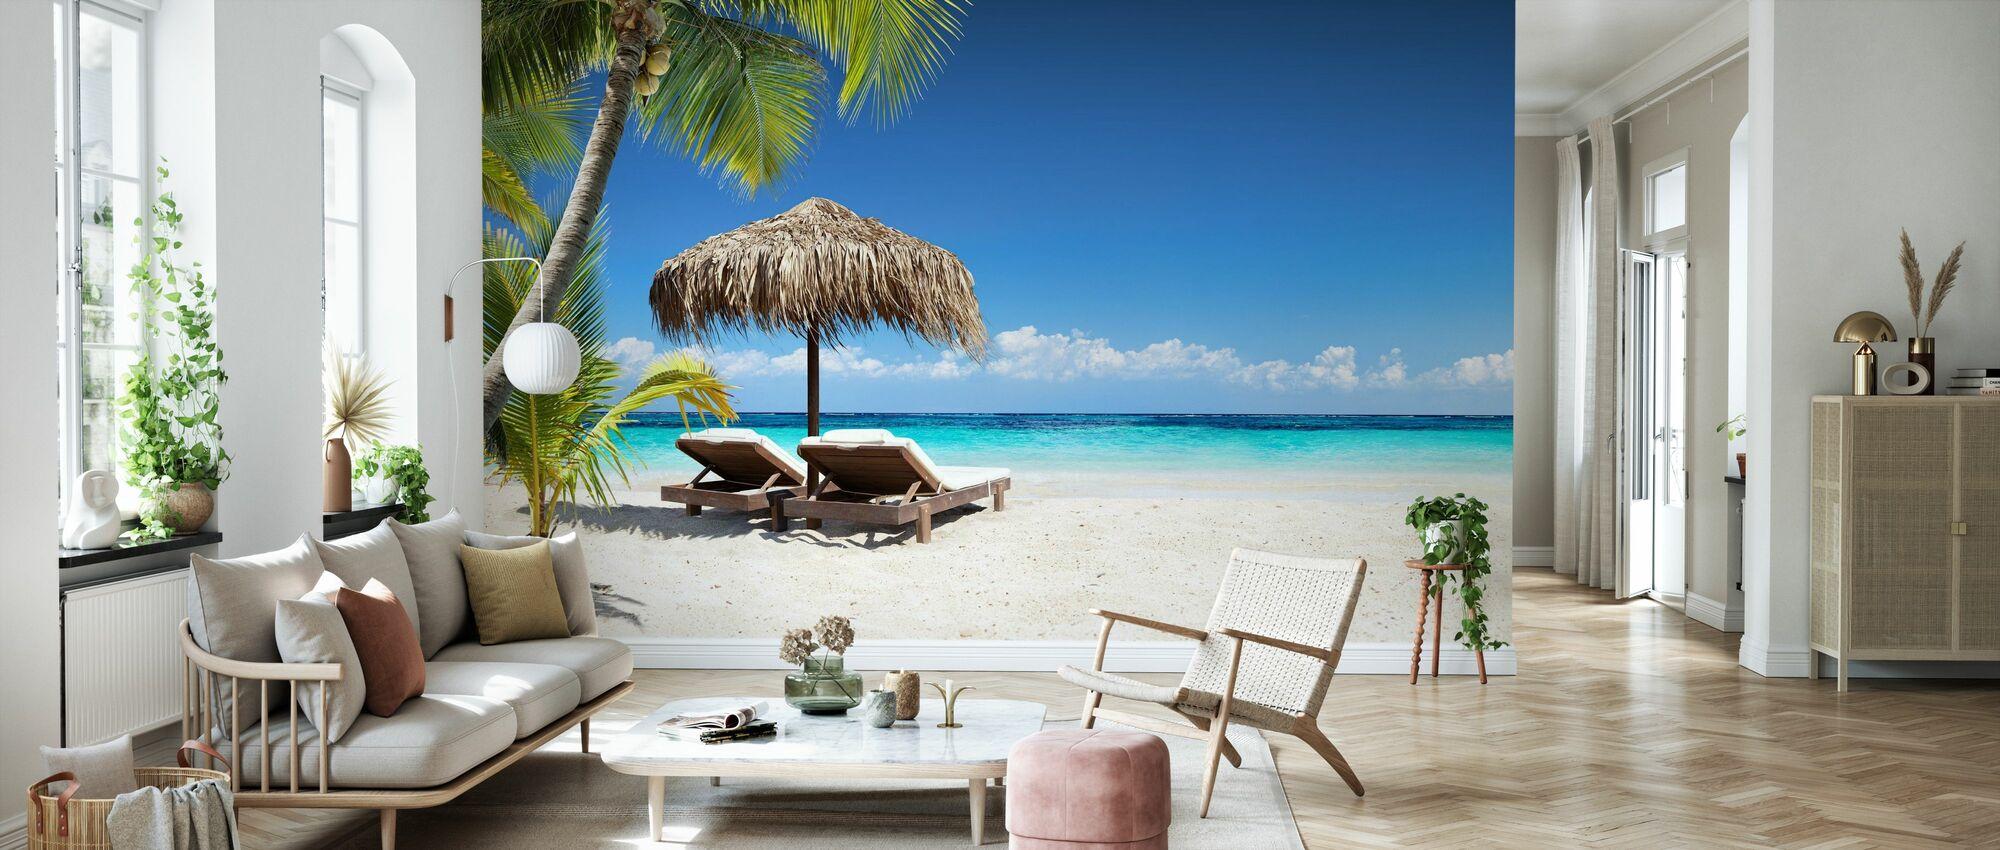 Coral Strand - Behang - Woonkamer